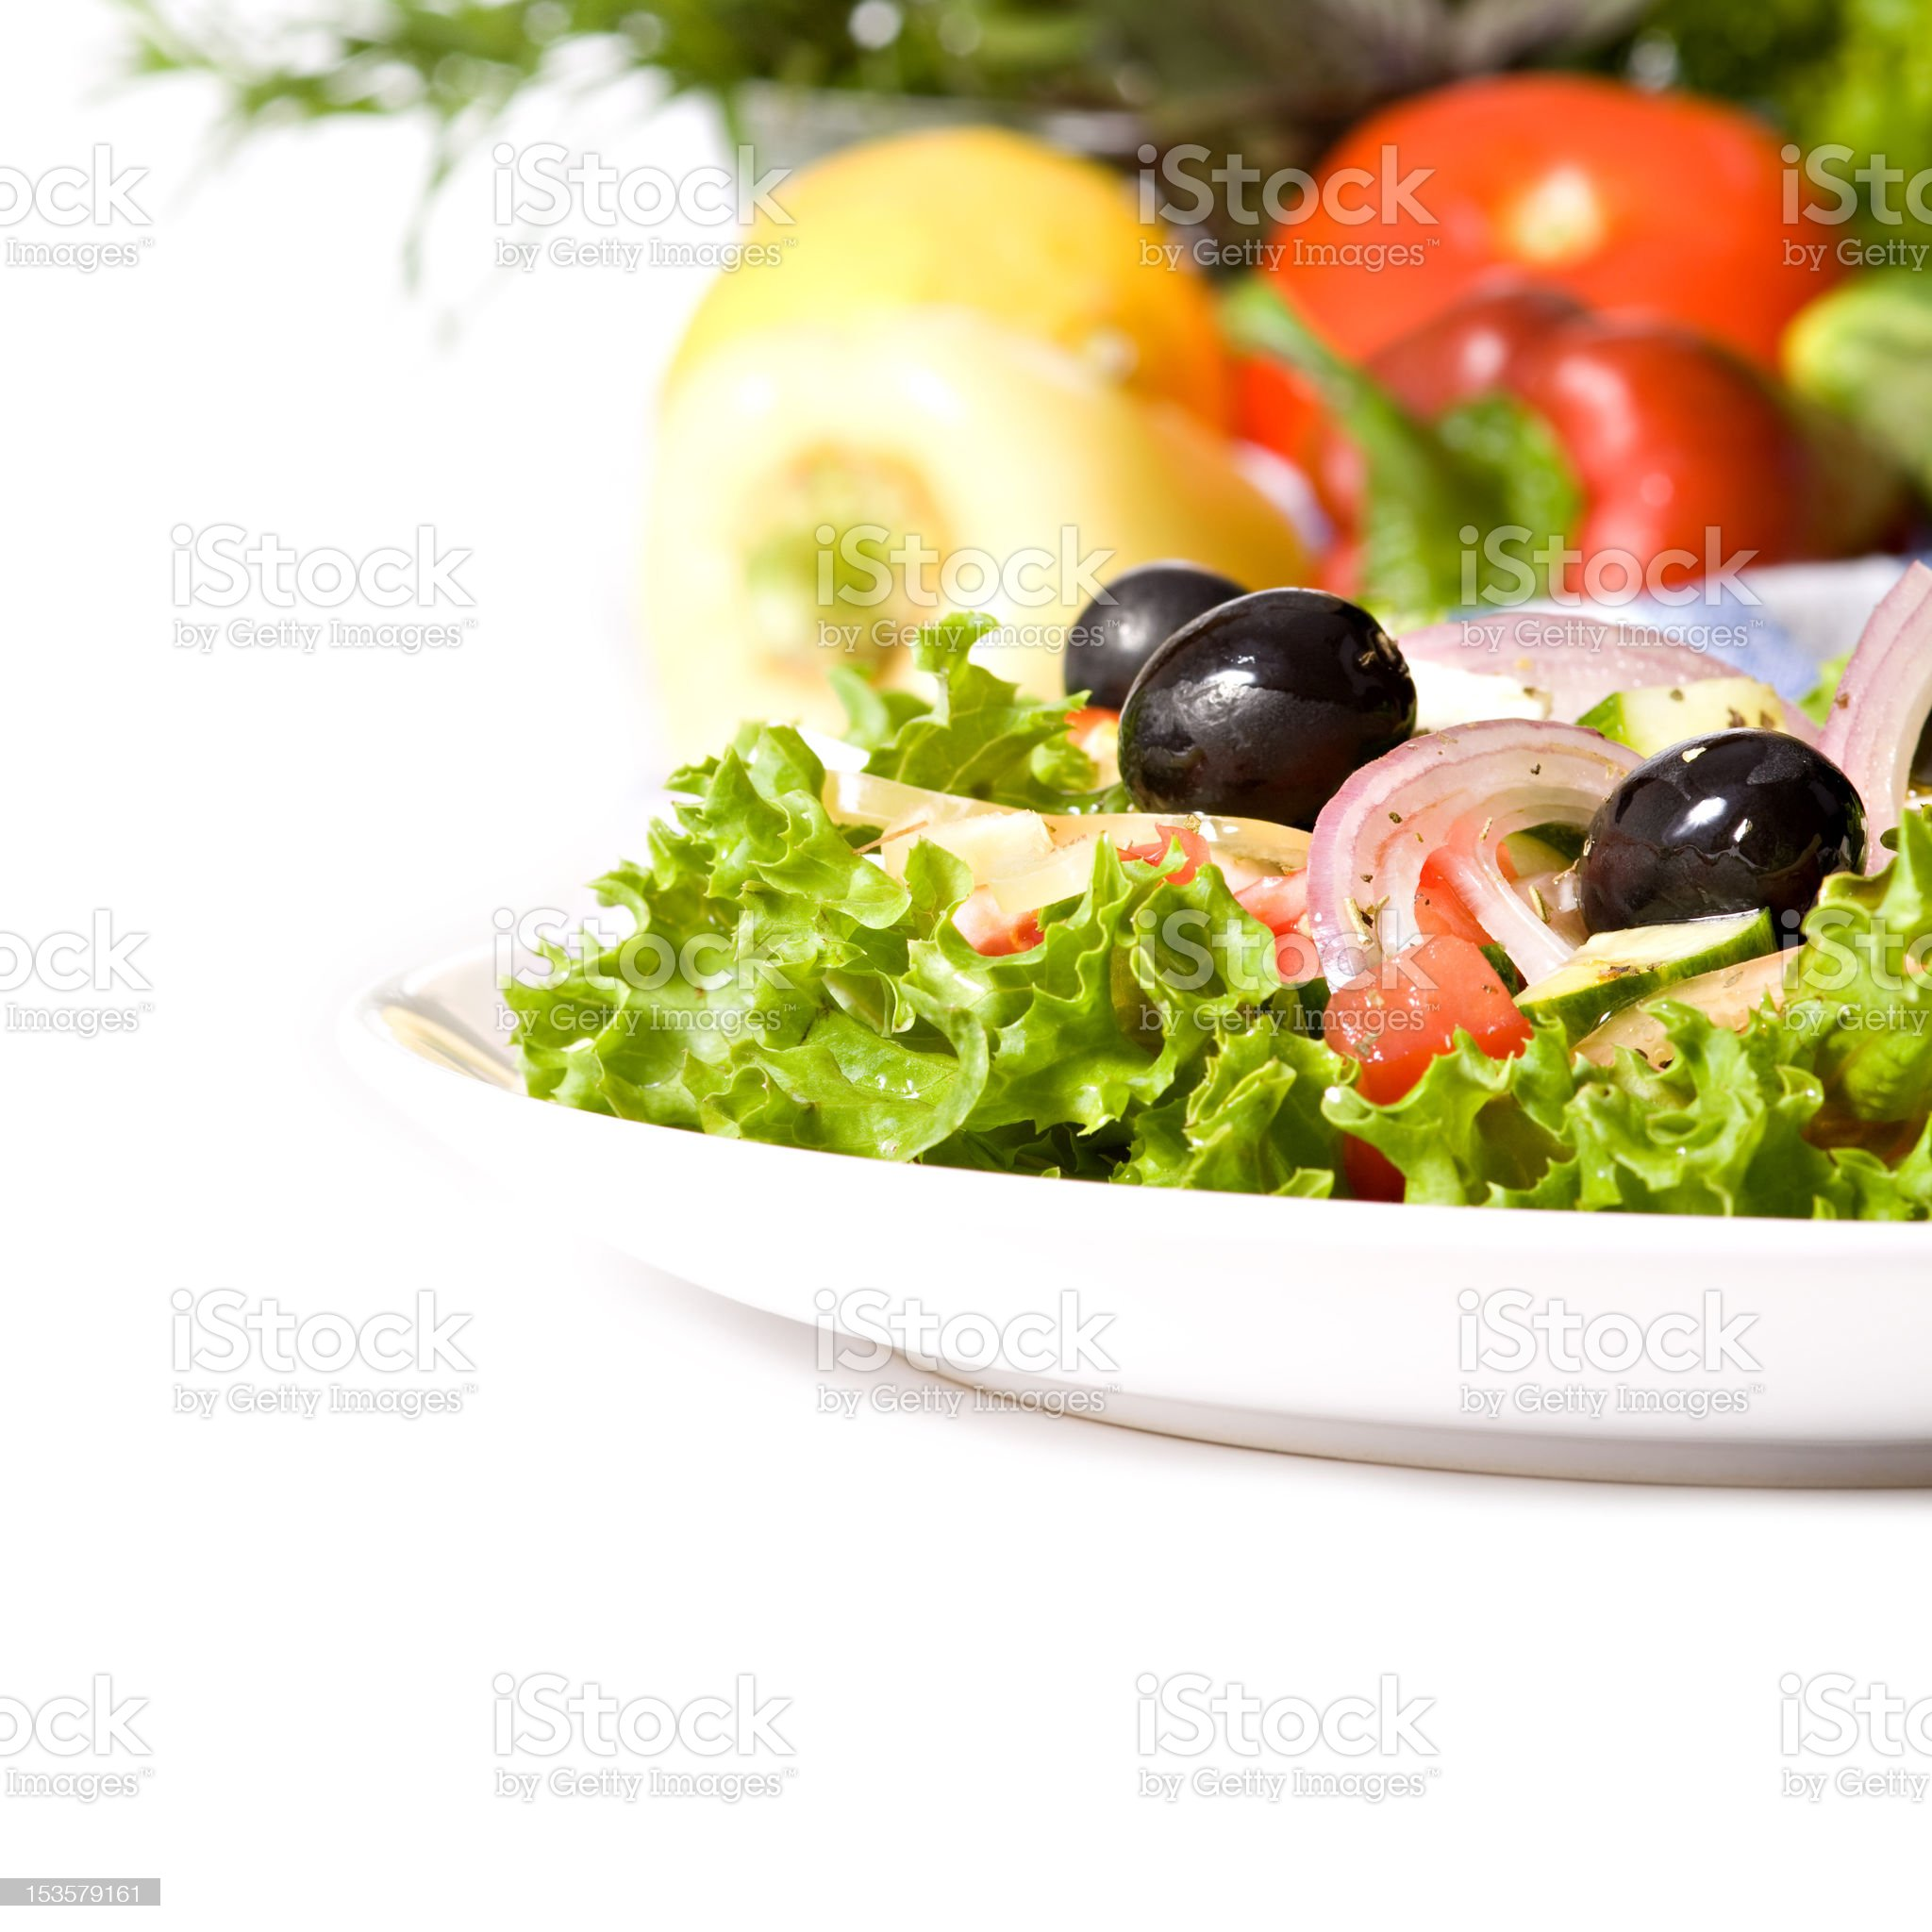 Healthy greek salad royalty-free stock photo